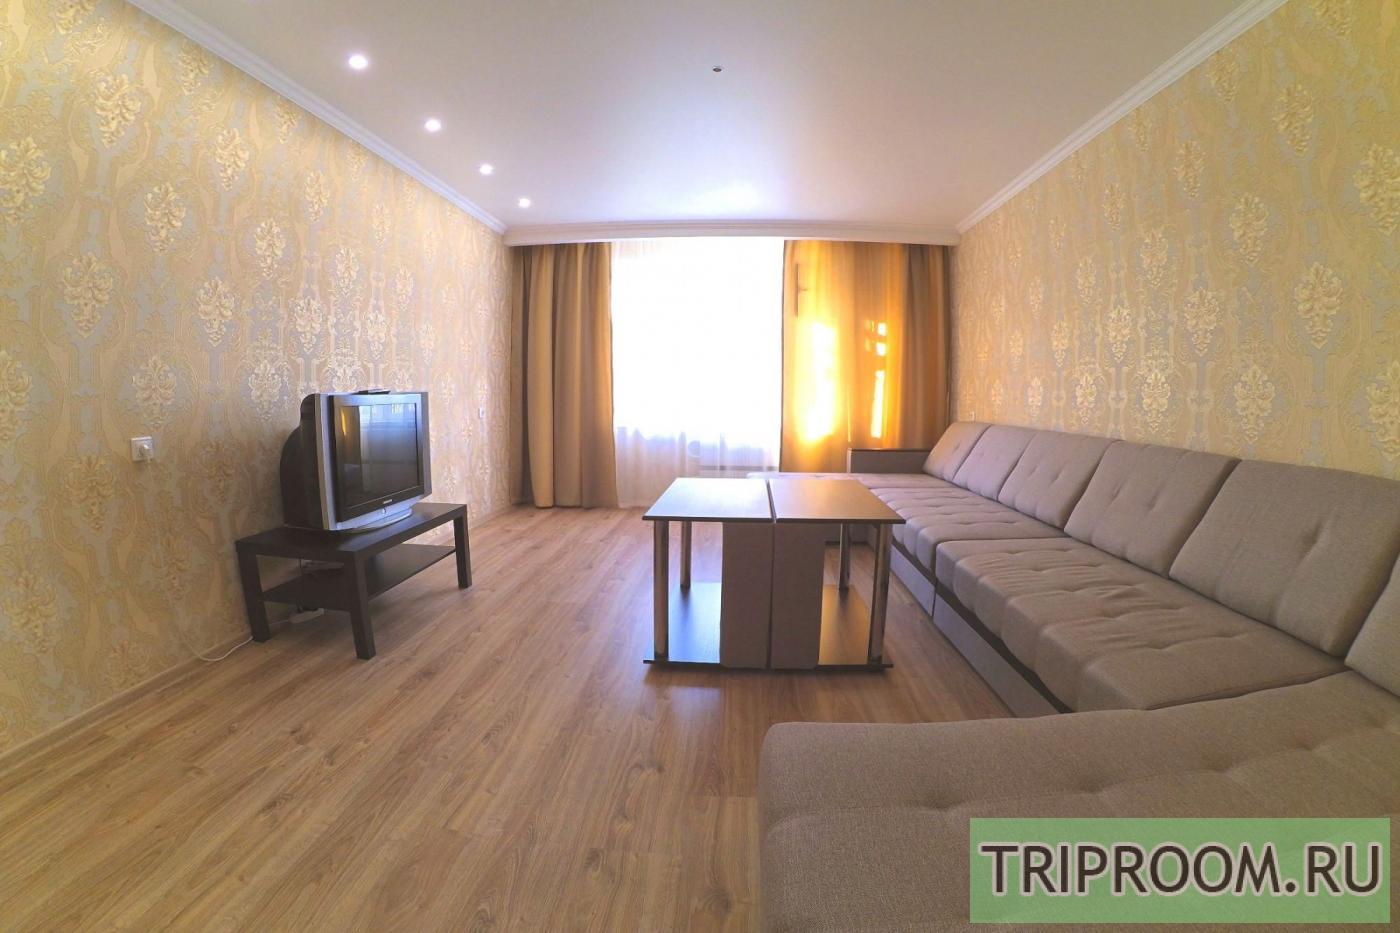 3-комнатная квартира посуточно (вариант № 20683), ул. Рашида Вагапова, фото № 1